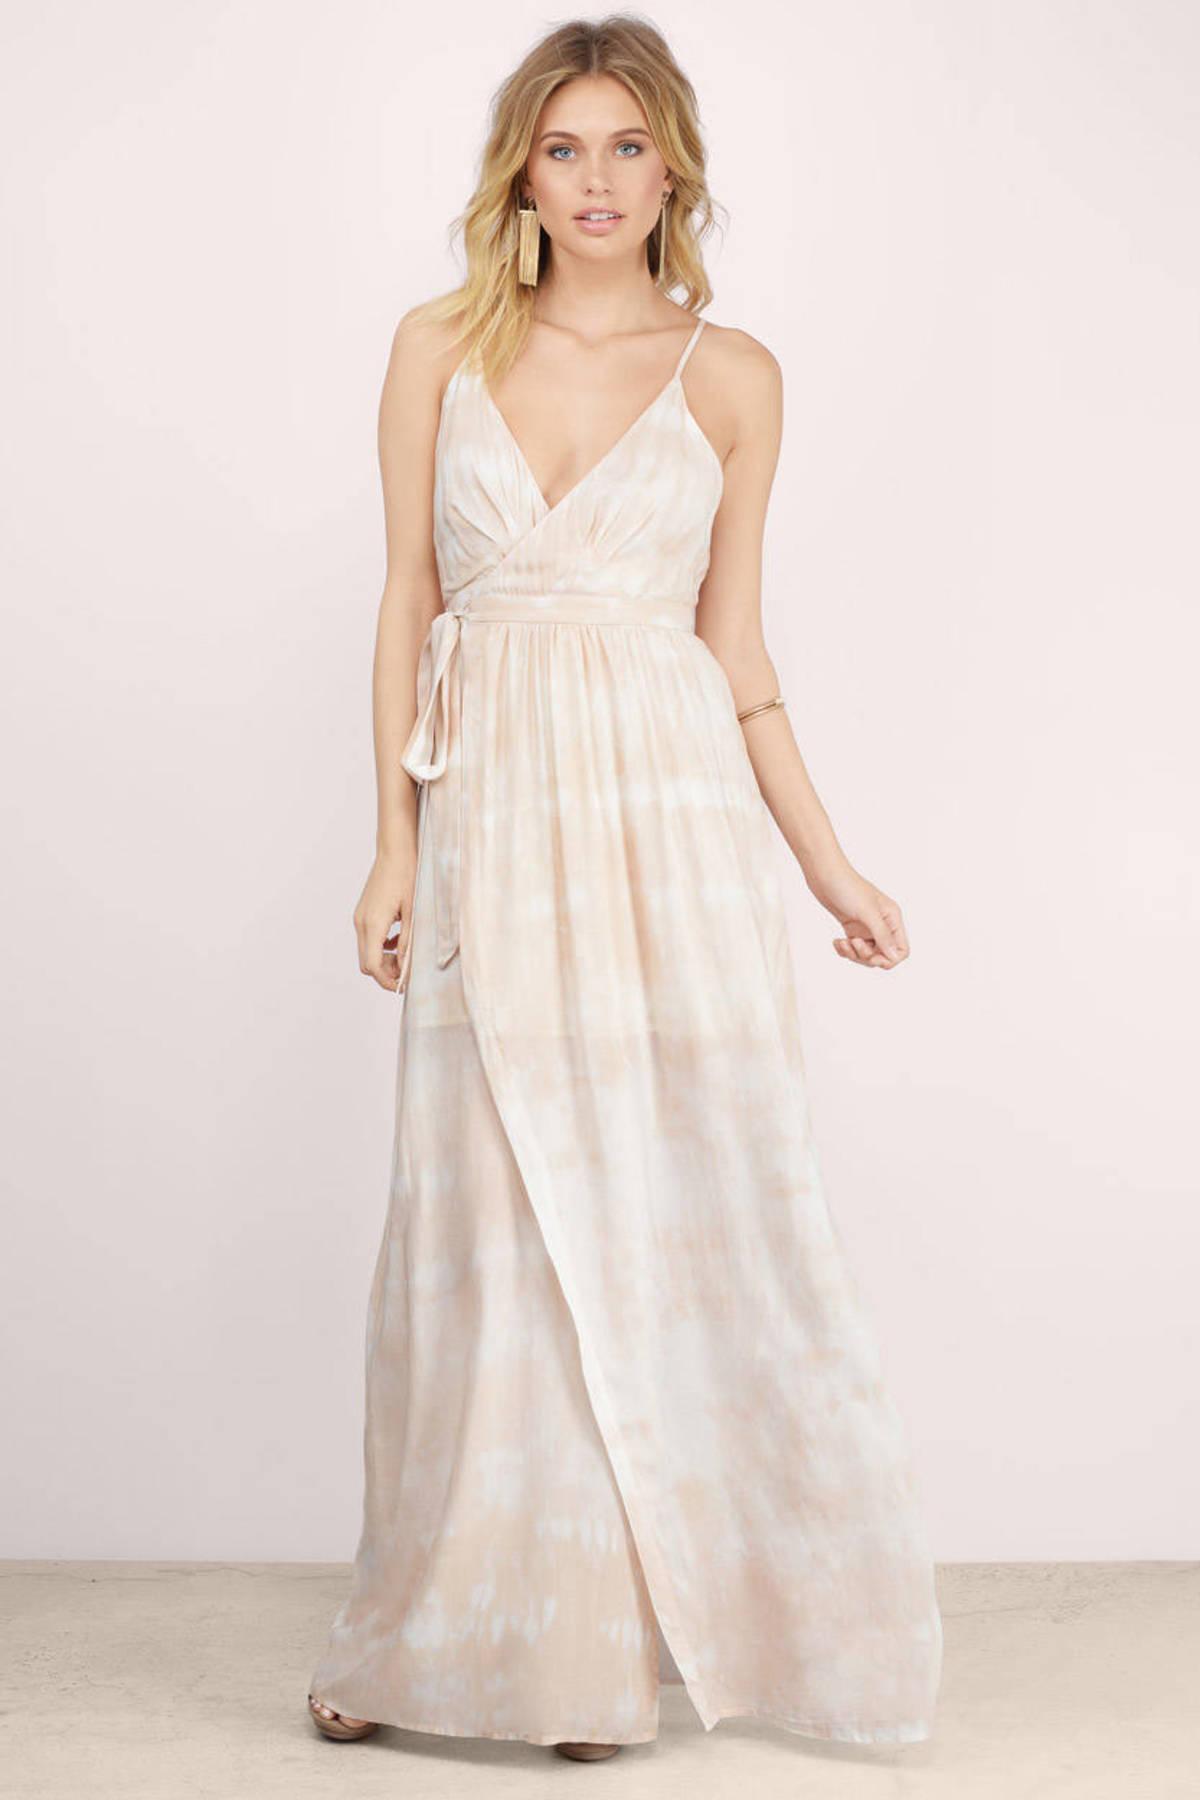 Long tie dye maxi dresses